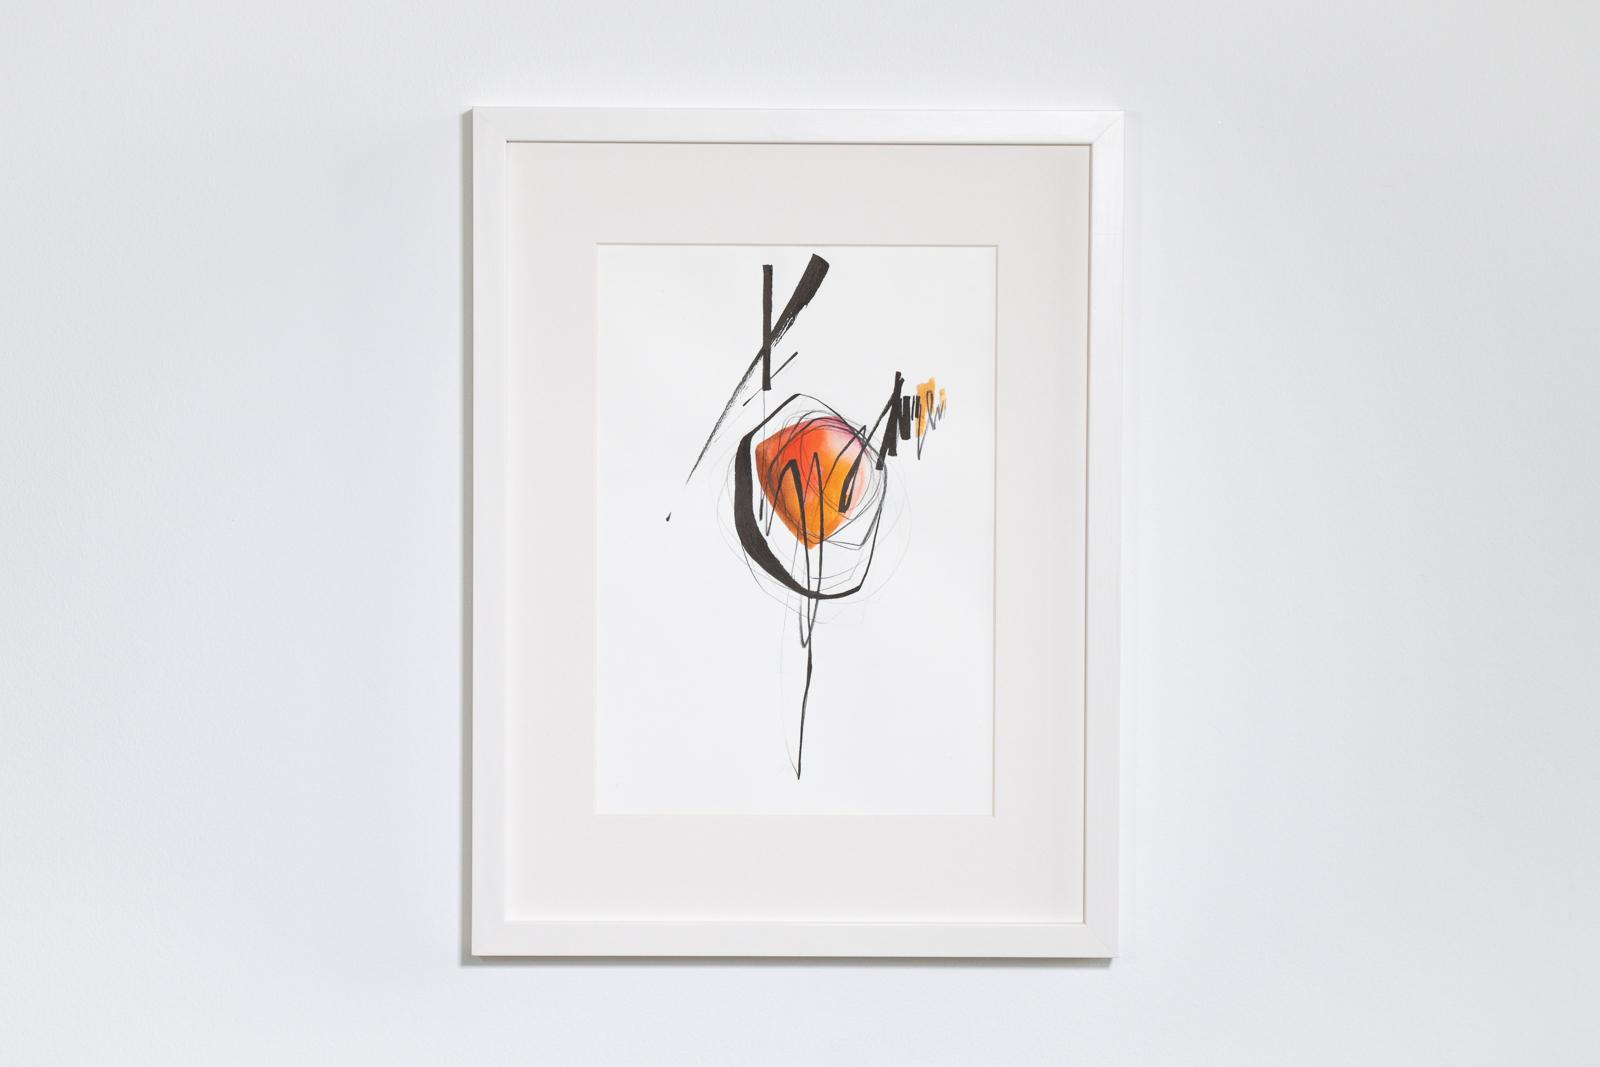 2018_StudioRehme_Ruetten_Paintings-15.jpg